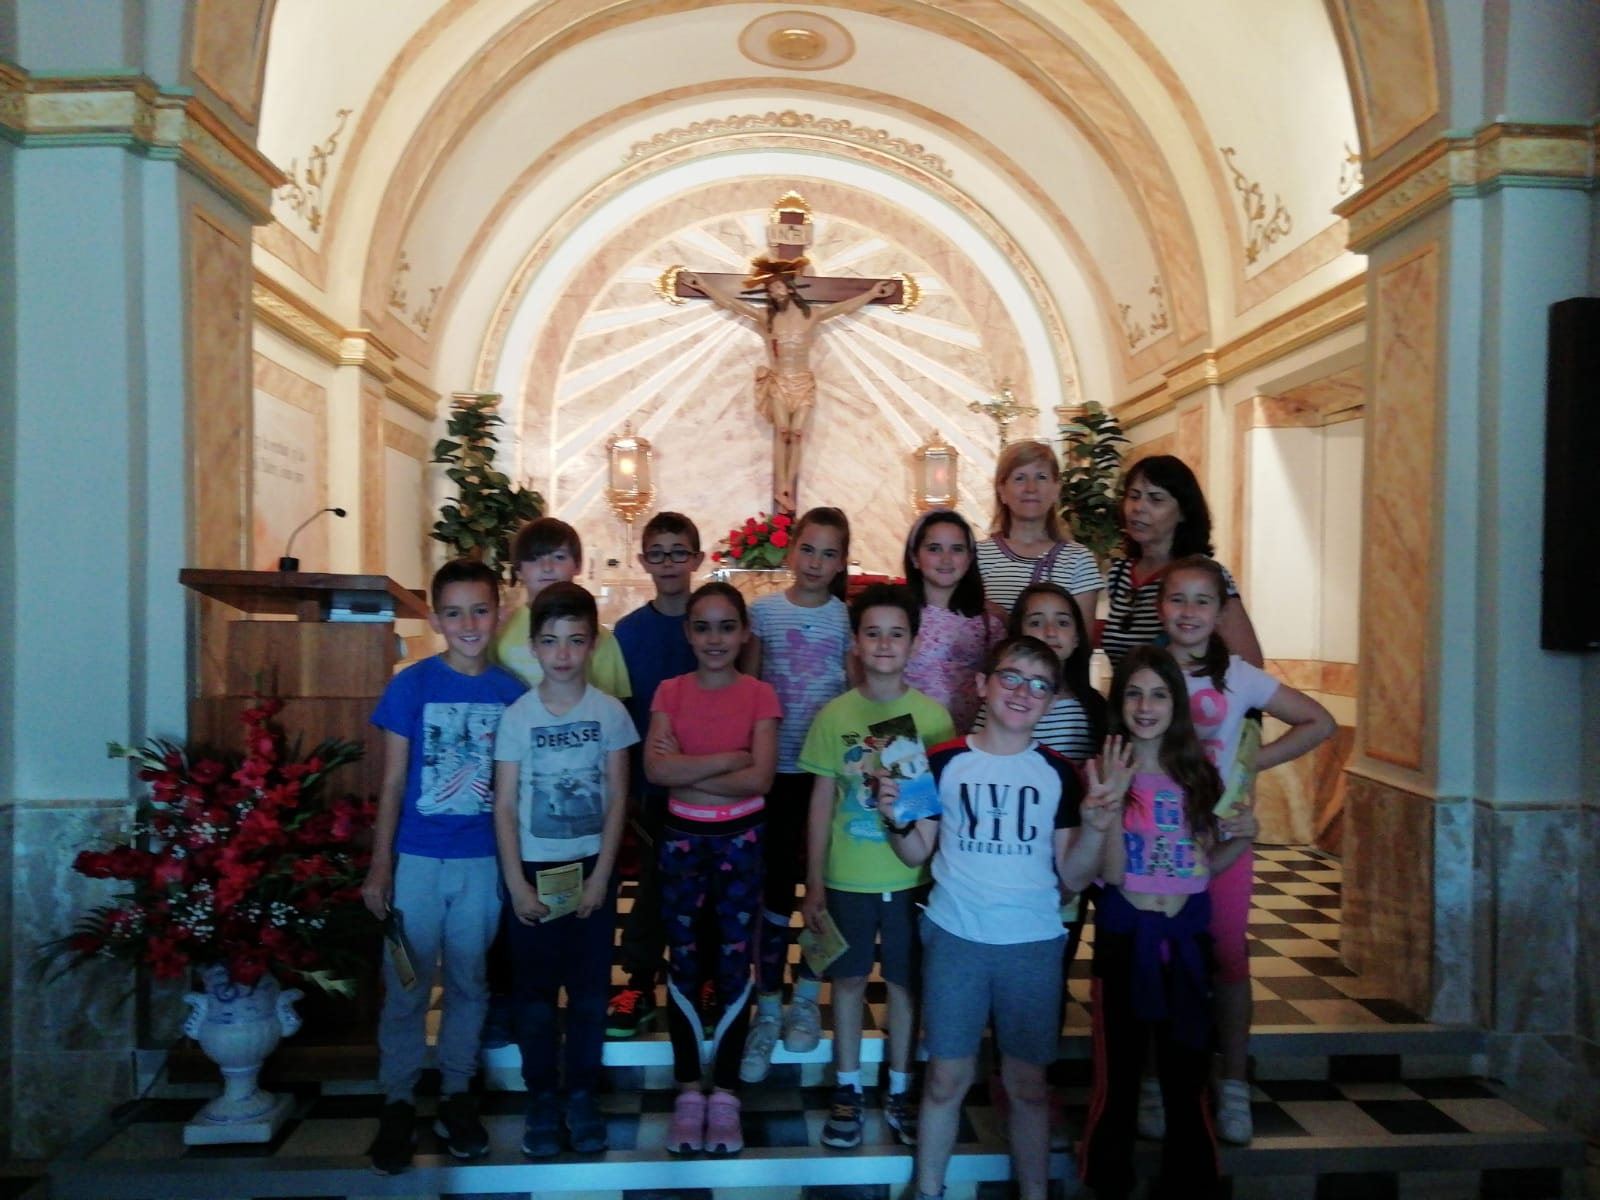 (2019-05-23) Visita ermita alumnos Laura - 3 C primaria - Reina Sofia - María Isabel Berenguer (09)